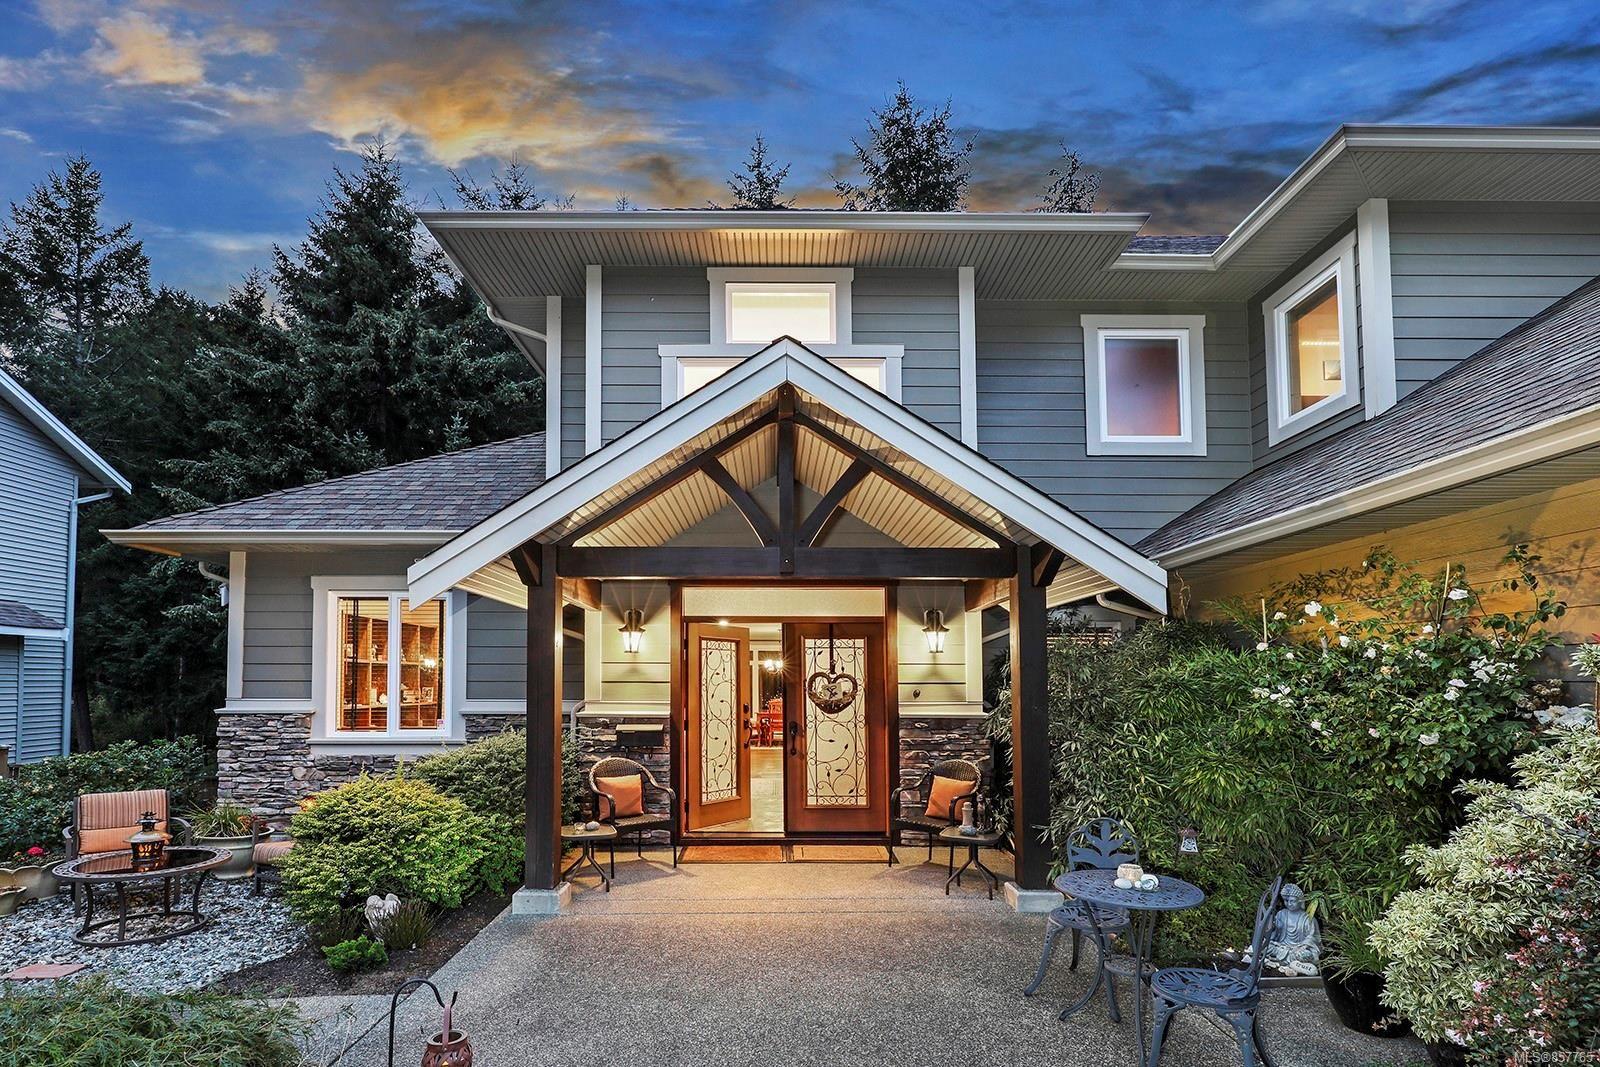 Photo 40: Photos: 1516 Highridge Dr in : CV Comox (Town of) House for sale (Comox Valley)  : MLS®# 857765